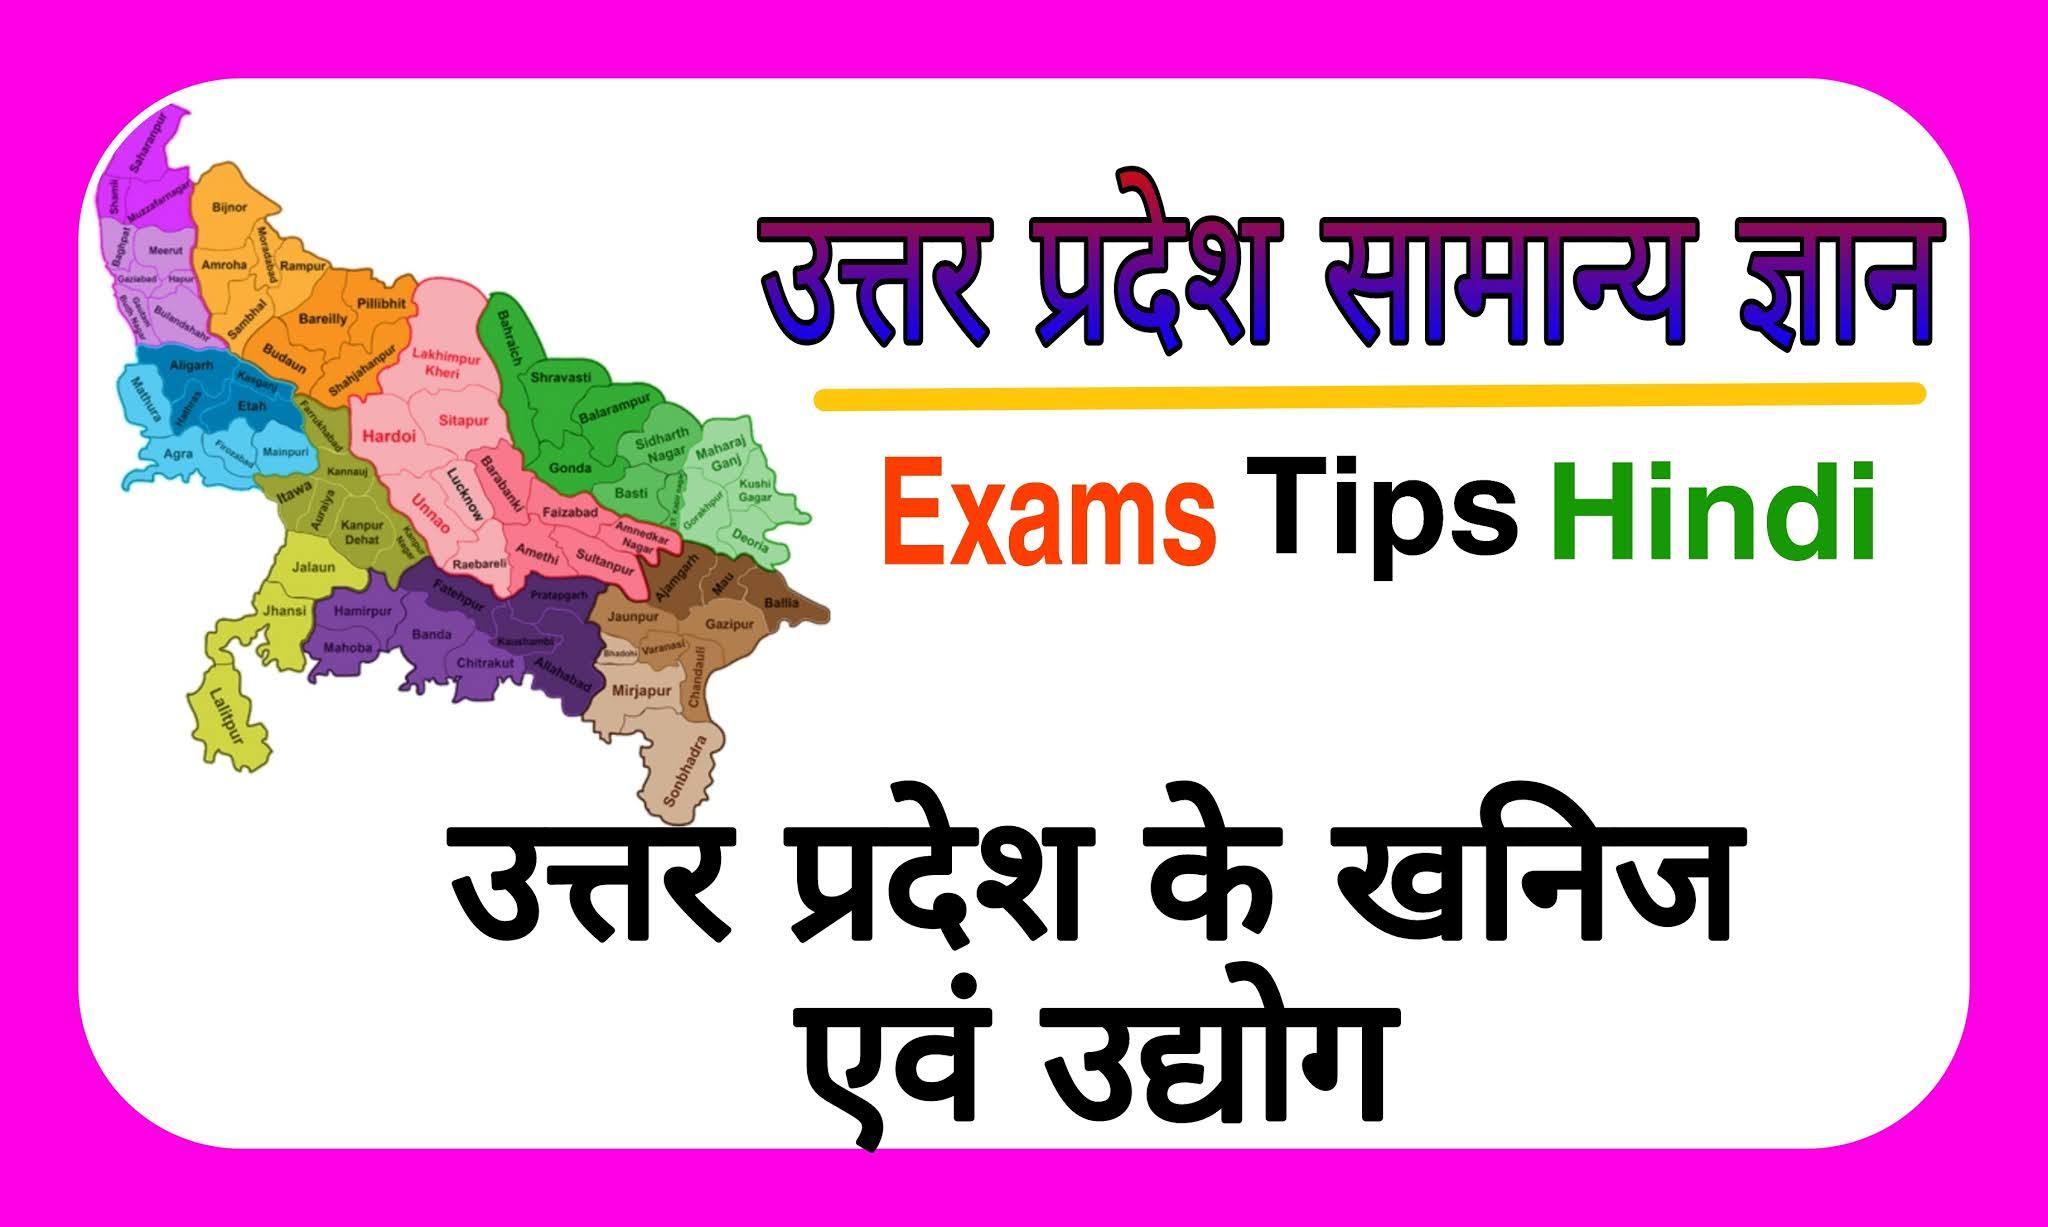 GK, उत्तर प्रदेश के खनिज, UP Minerals GK in Hindi, UP industries gk in hindi, UP GK in Hindi, Uttar Pradesh ke khanij, UP ki Jankari